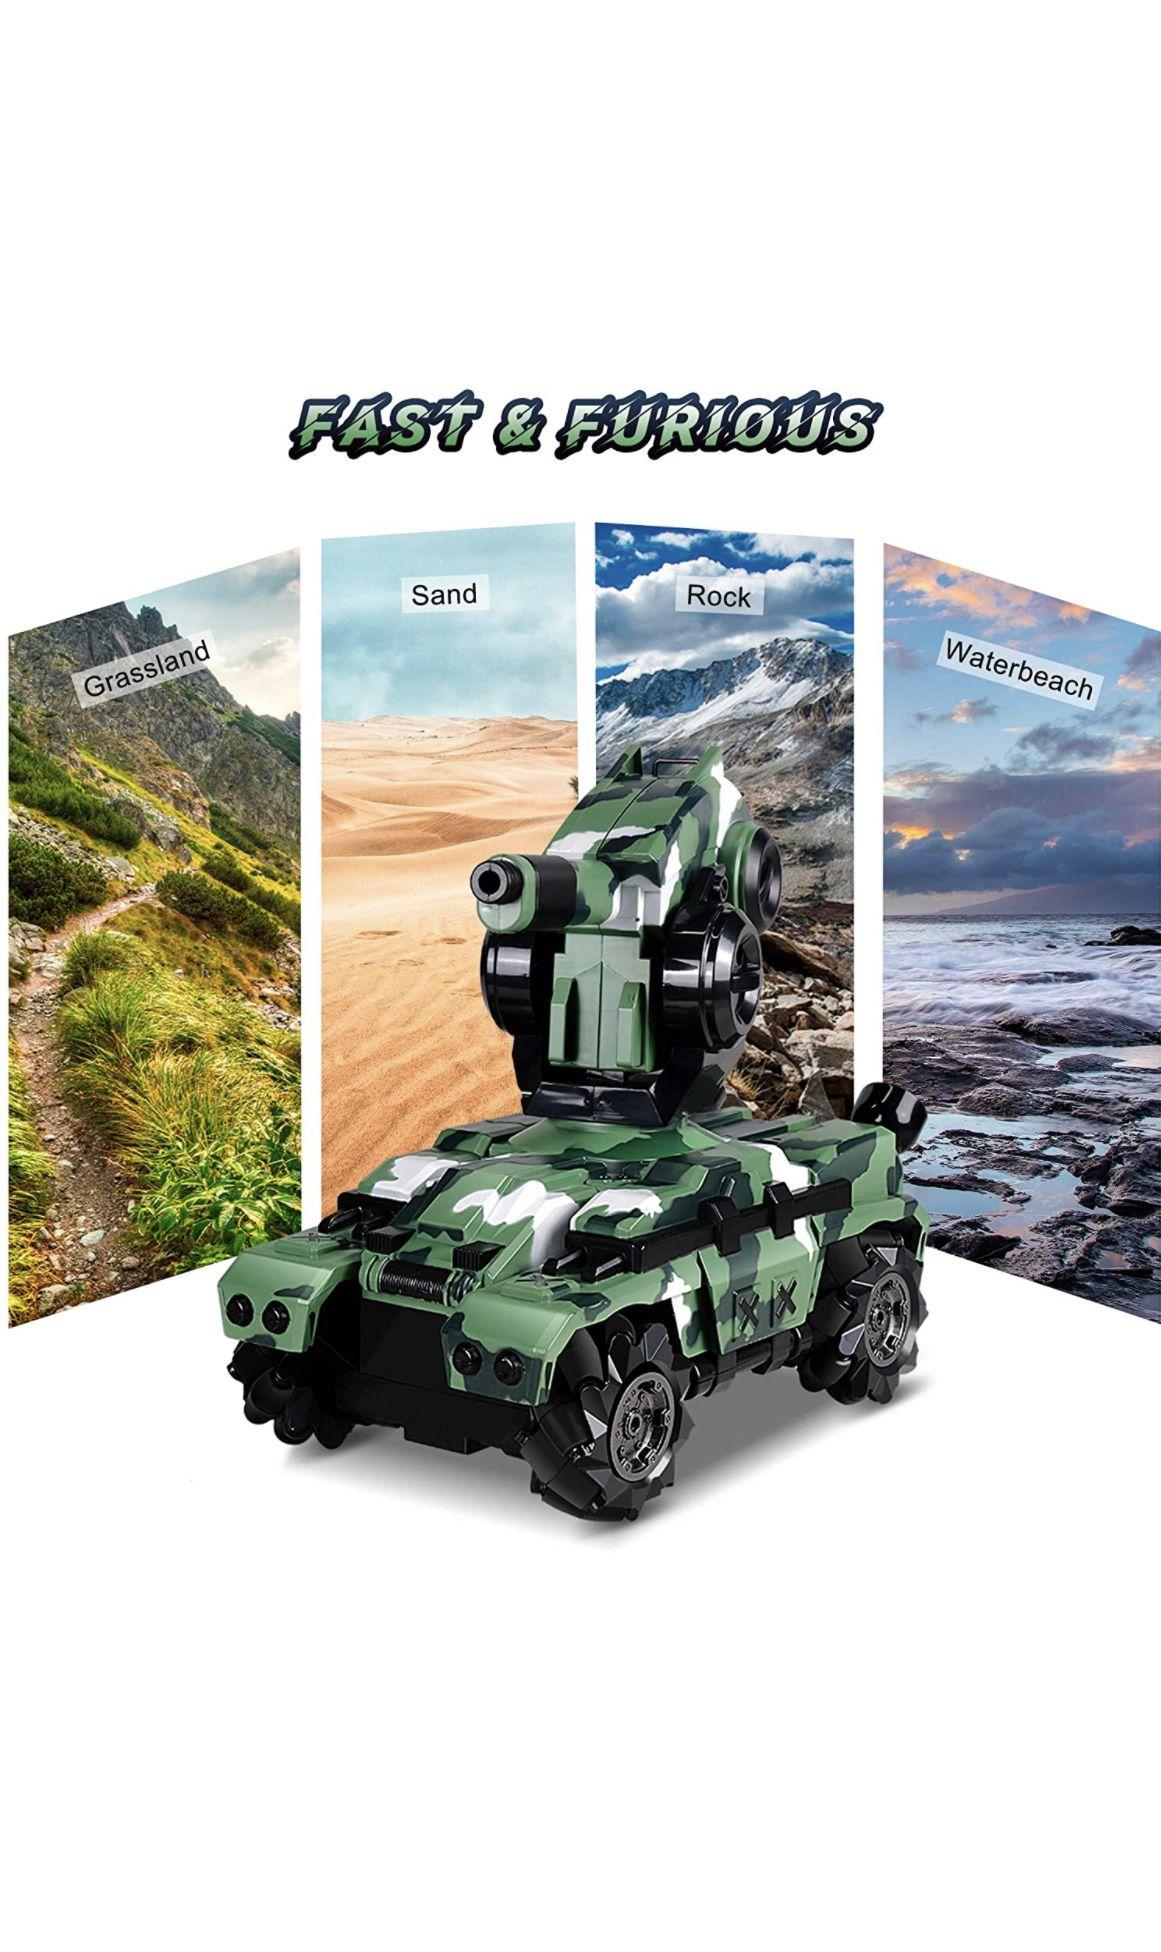 Remote Control Car RC Tank Car Waterproof with 180° Rotating Shooting & 360° Rotating Vehicle,